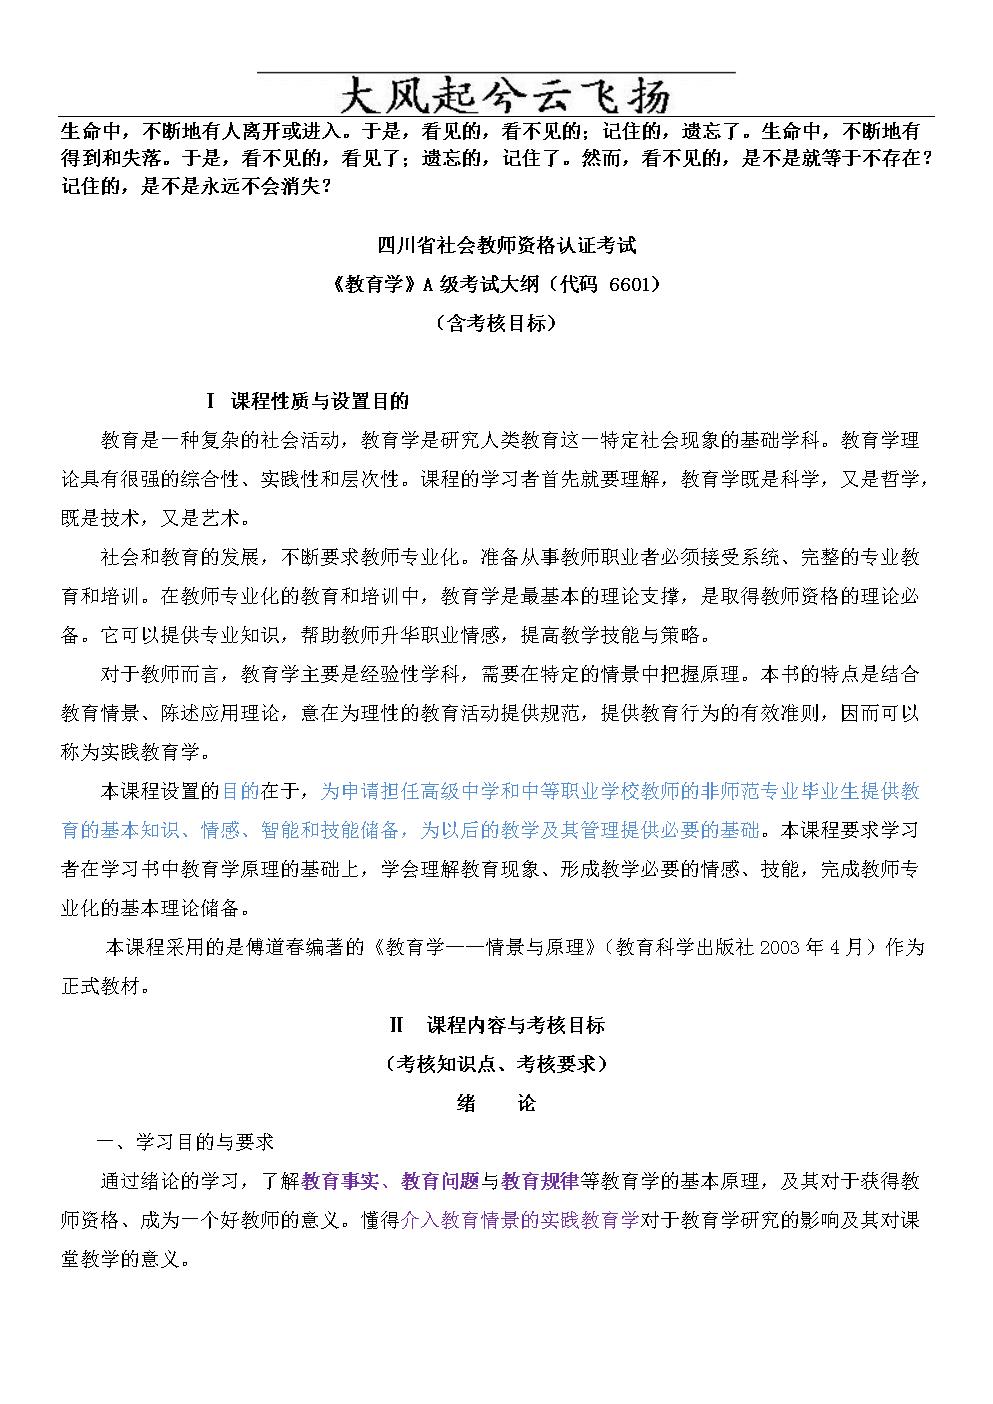 Qszpjm四川省社会教师资格认证考试《教育学》A级考试大纲.doc